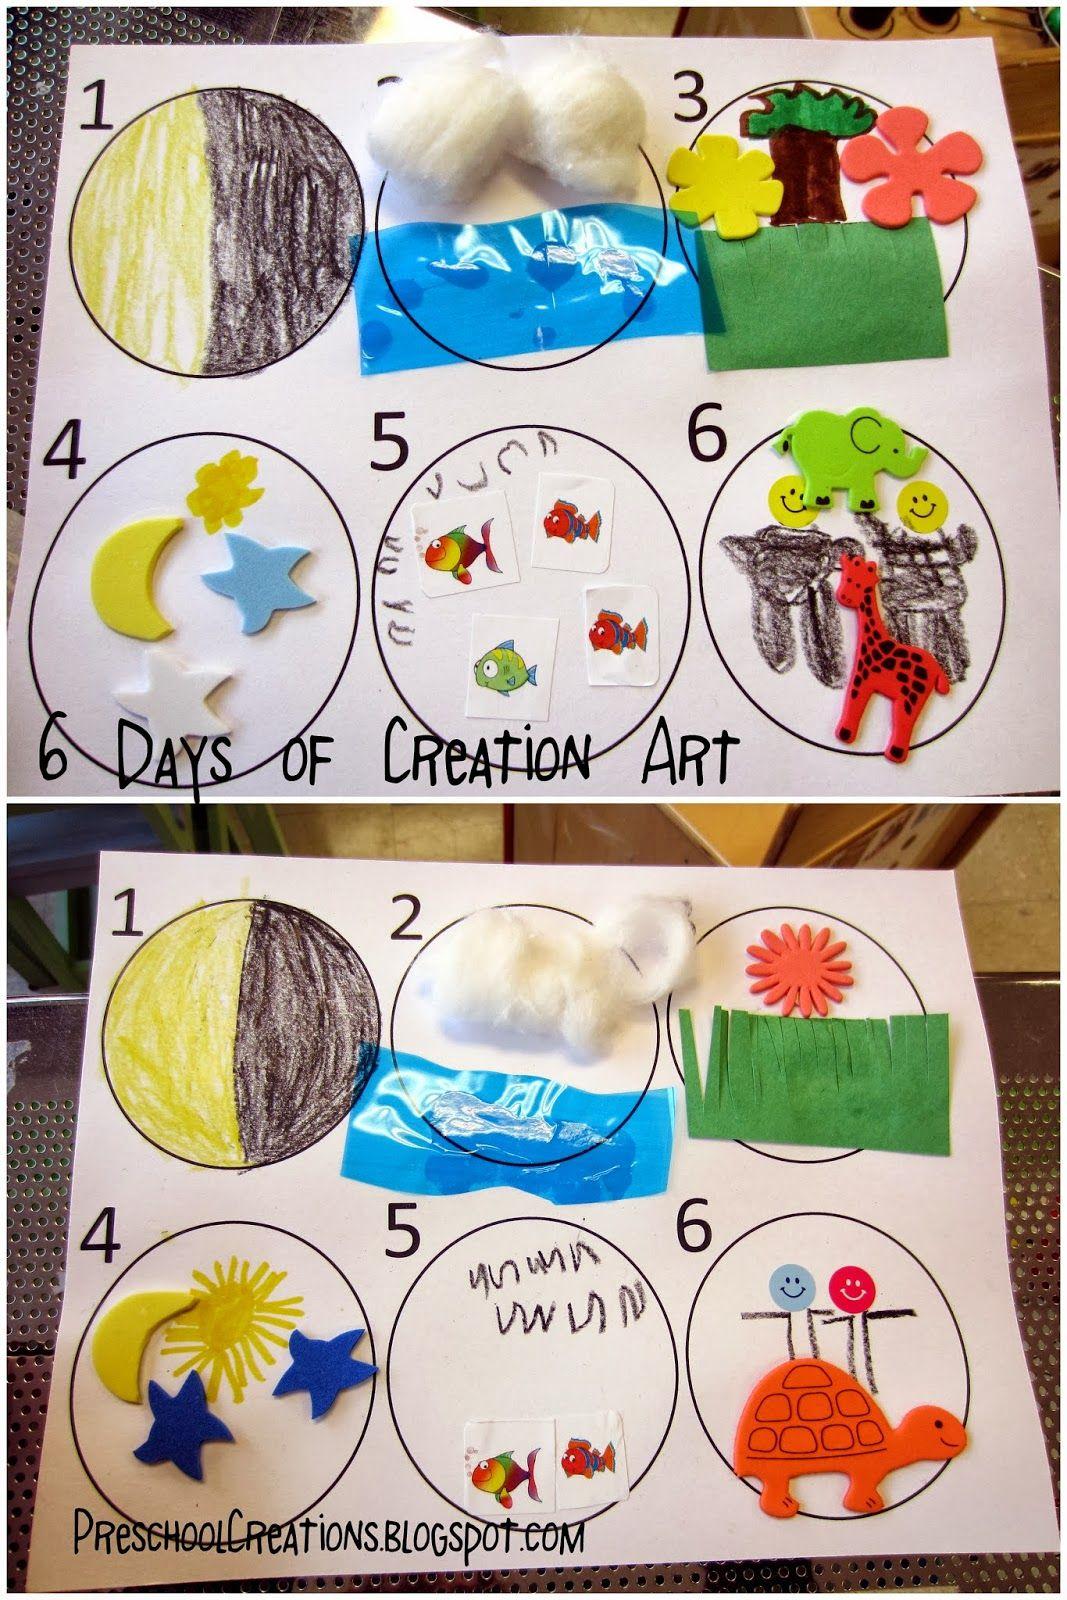 Preschool creations 6 days of creation activities psr preschool creations 6 days of creation activities sciox Choice Image